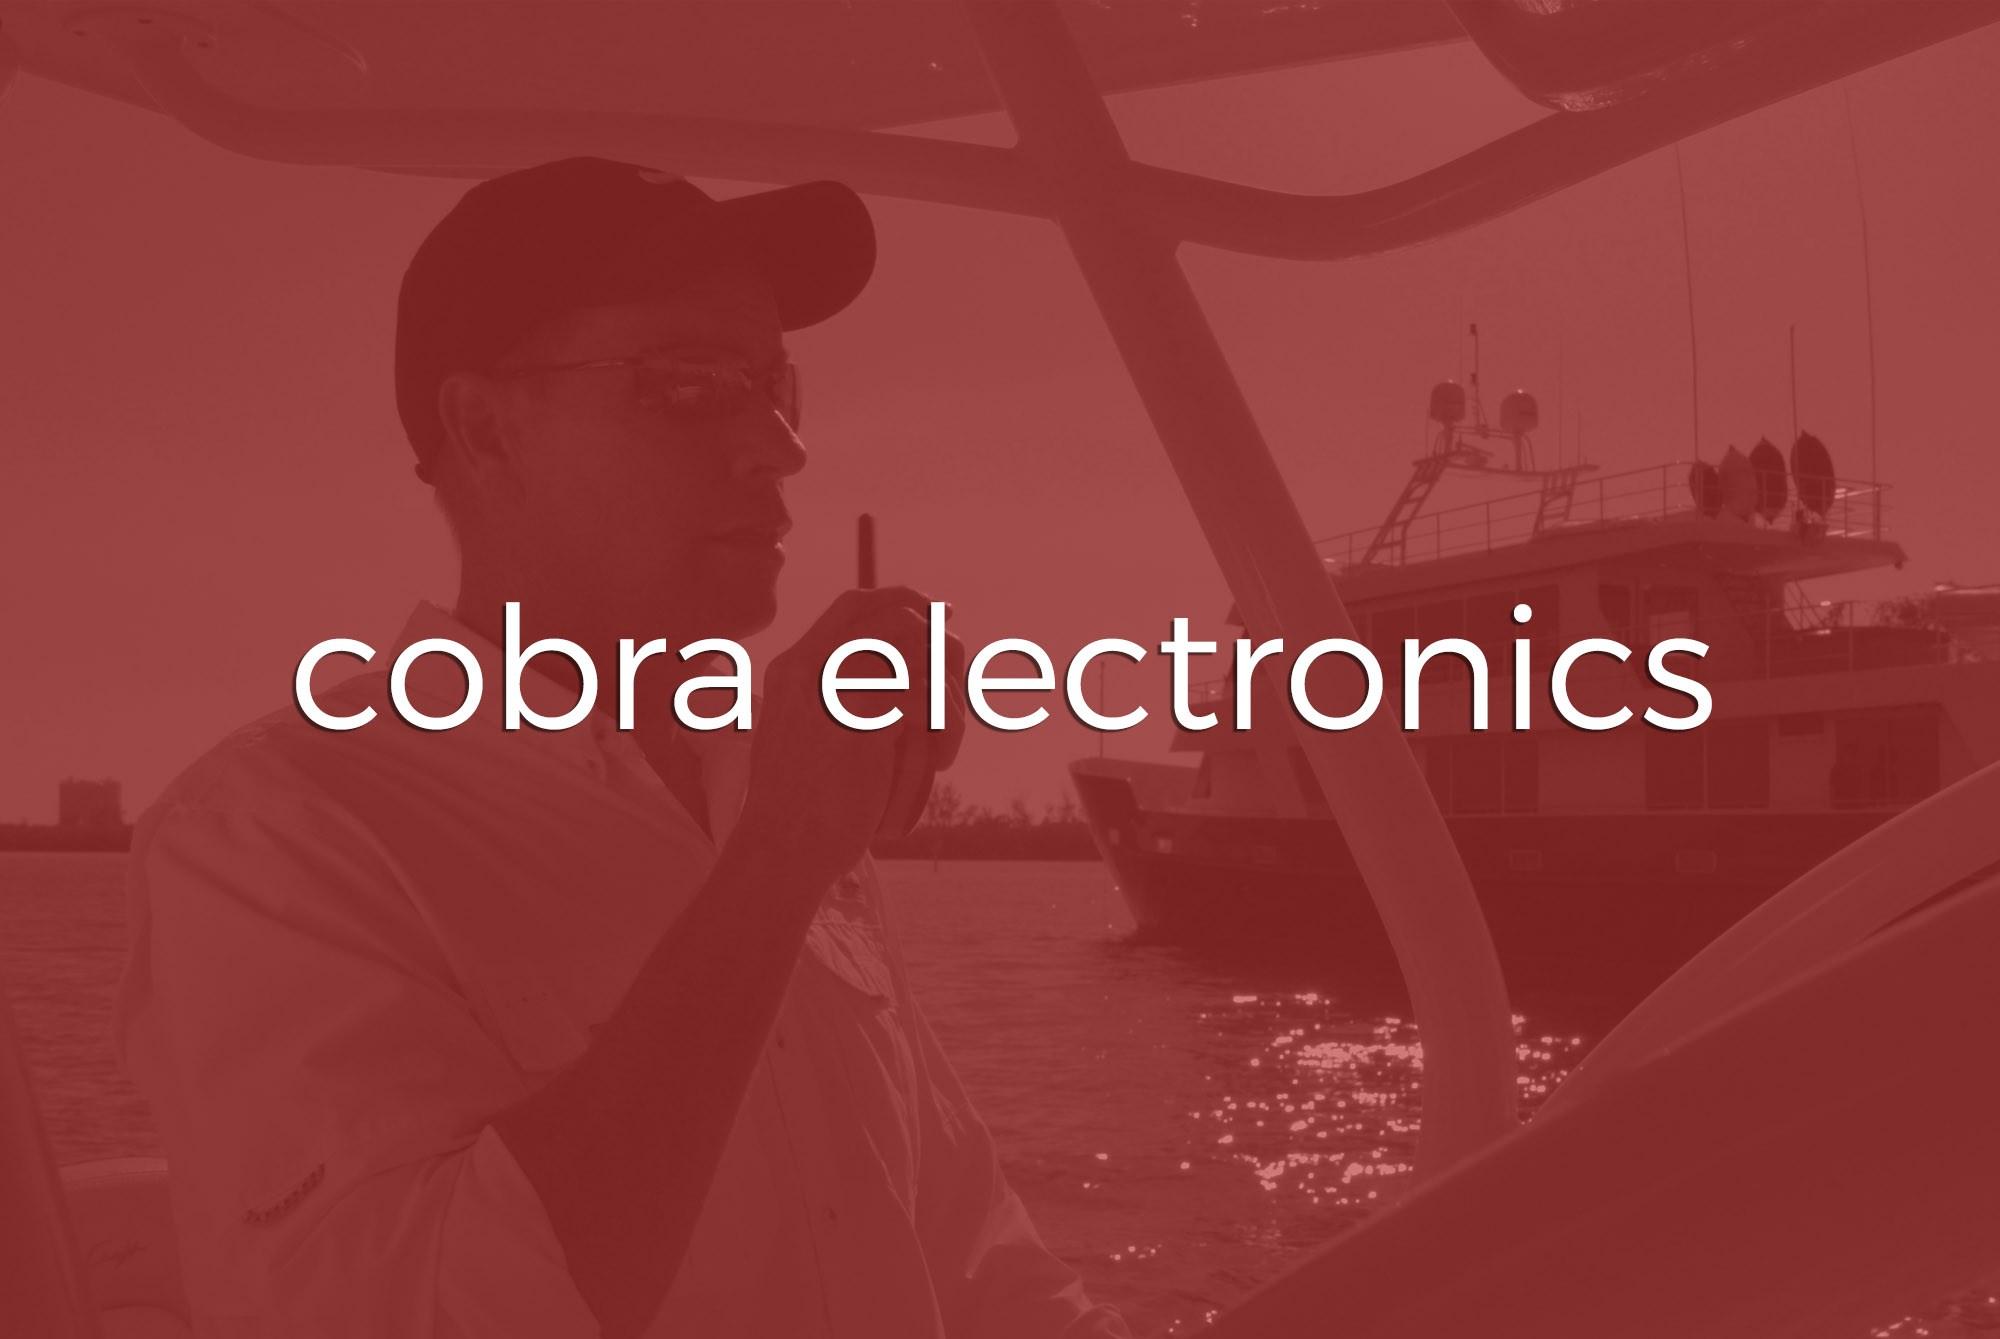 Commercial Videography & Advertising | Sarasota | Cobra Electronics